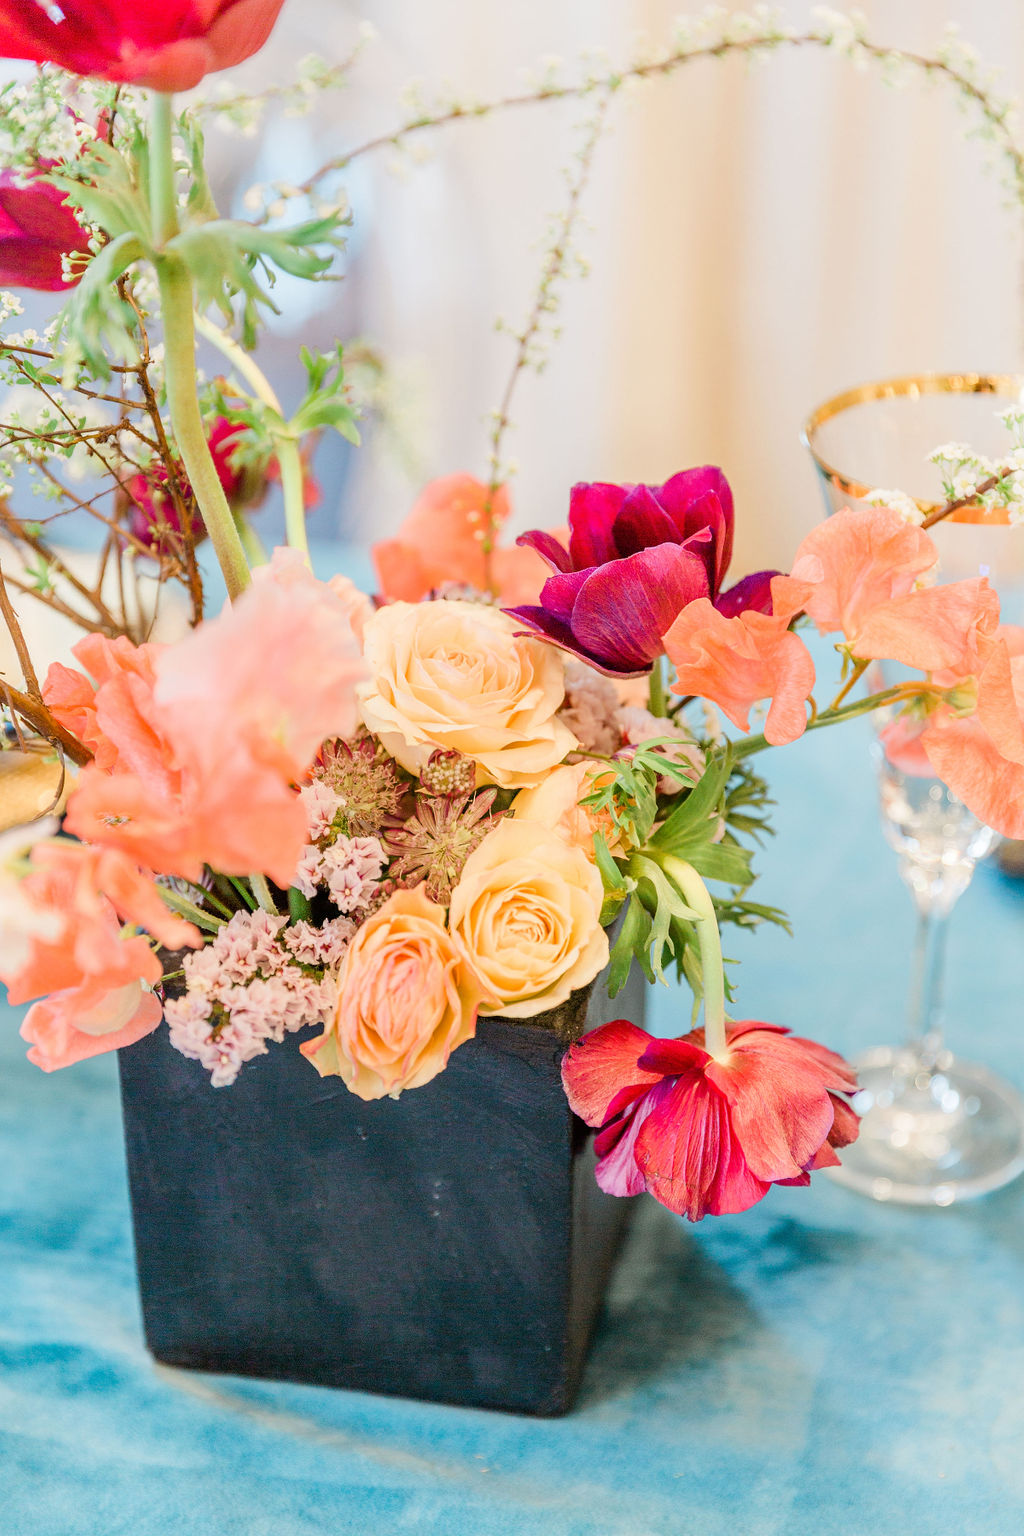 TheBigFakeWeddingSacramento-April2019-Sneaks-LaurenAlissePhotography-169.jpg